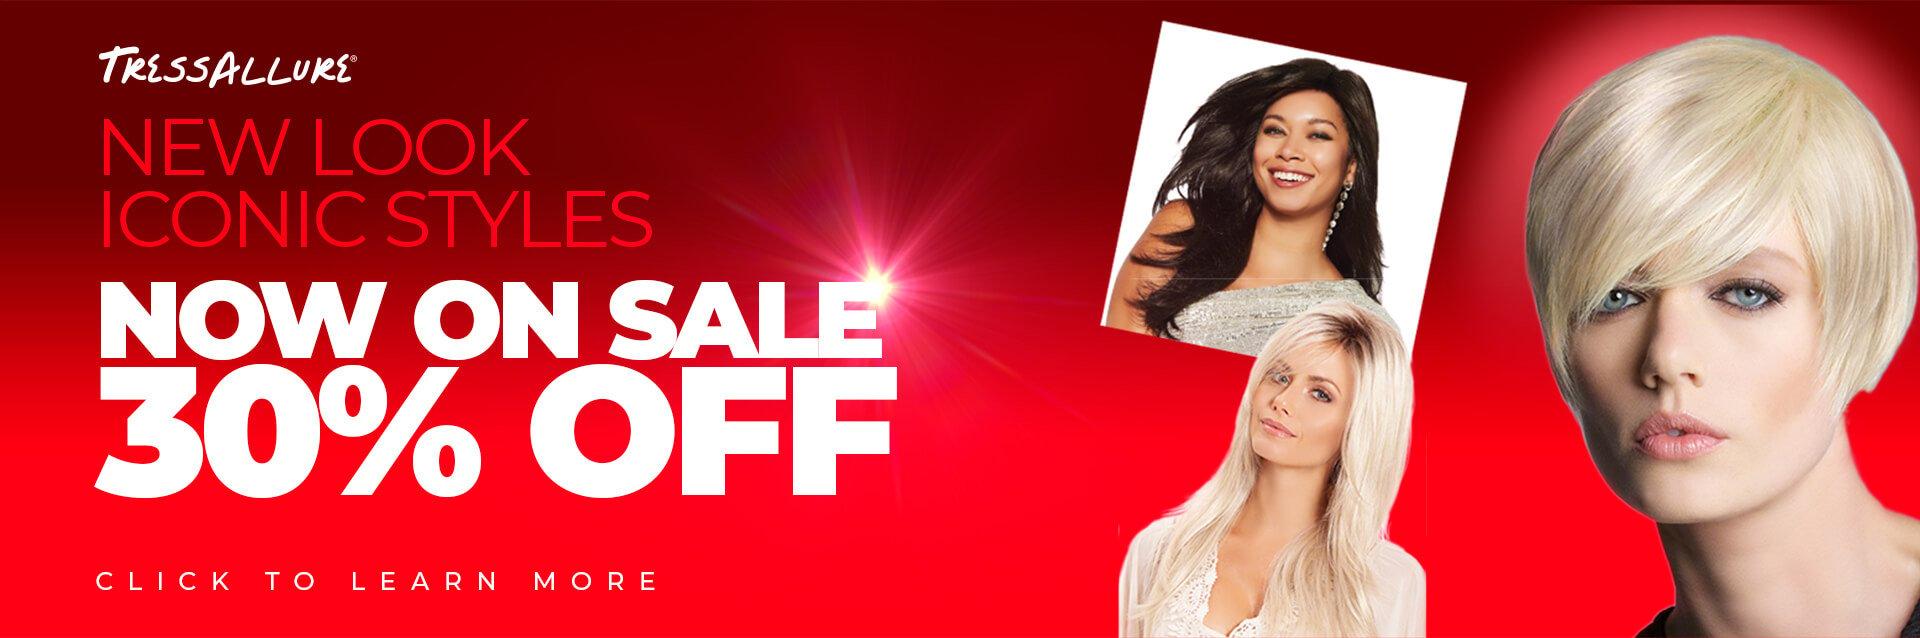 Tressallure Wigs sale